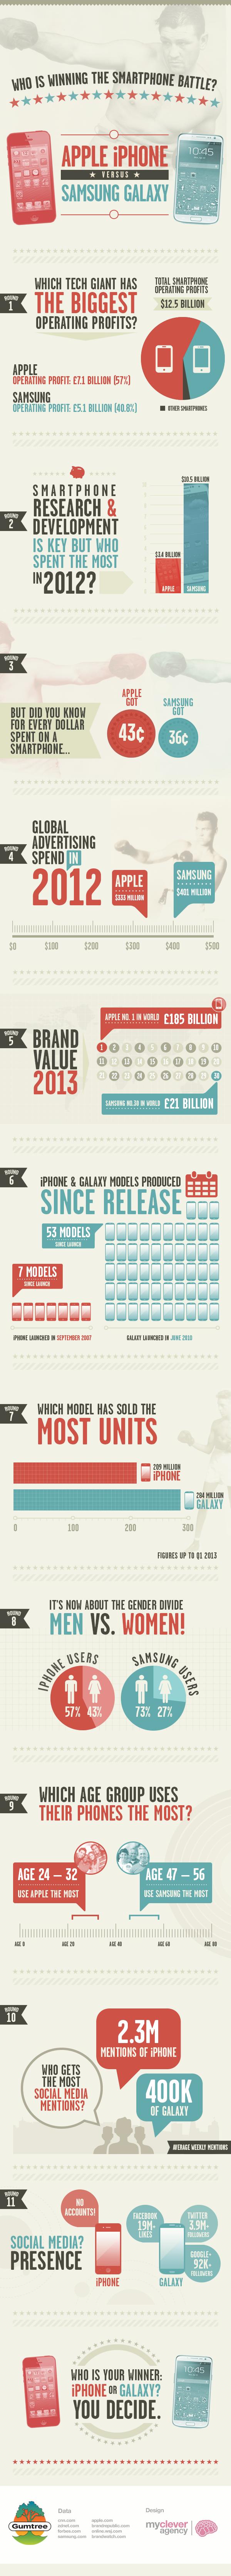 apple iphone vs samsung-galaxy